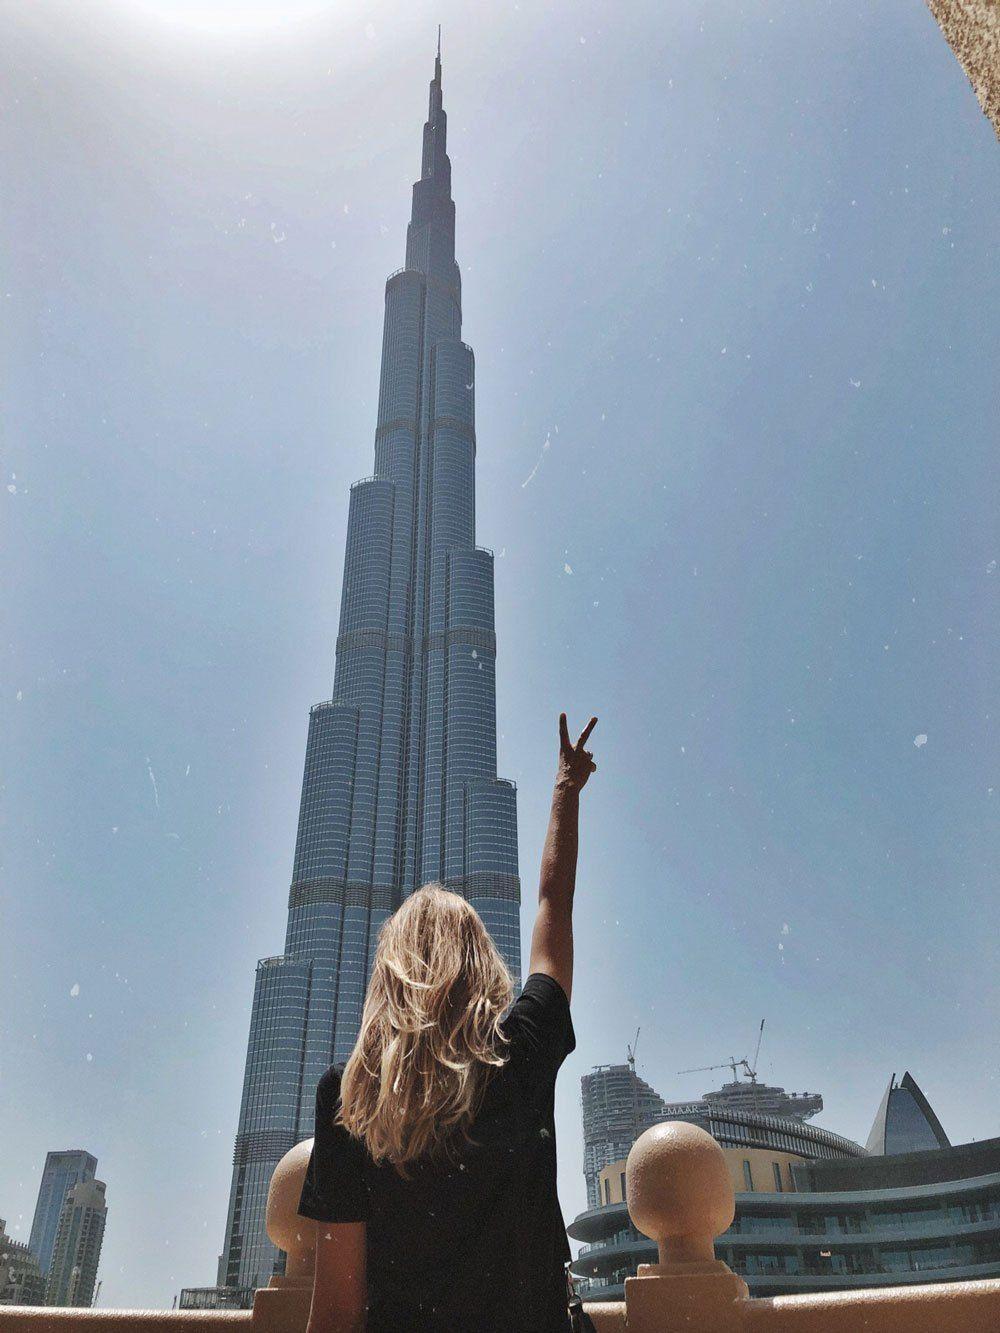 The Most Instagrammable Spots In Dubai Marietheresesaskia Dubai Travel Guide Dubai Vacation Dubai Travel